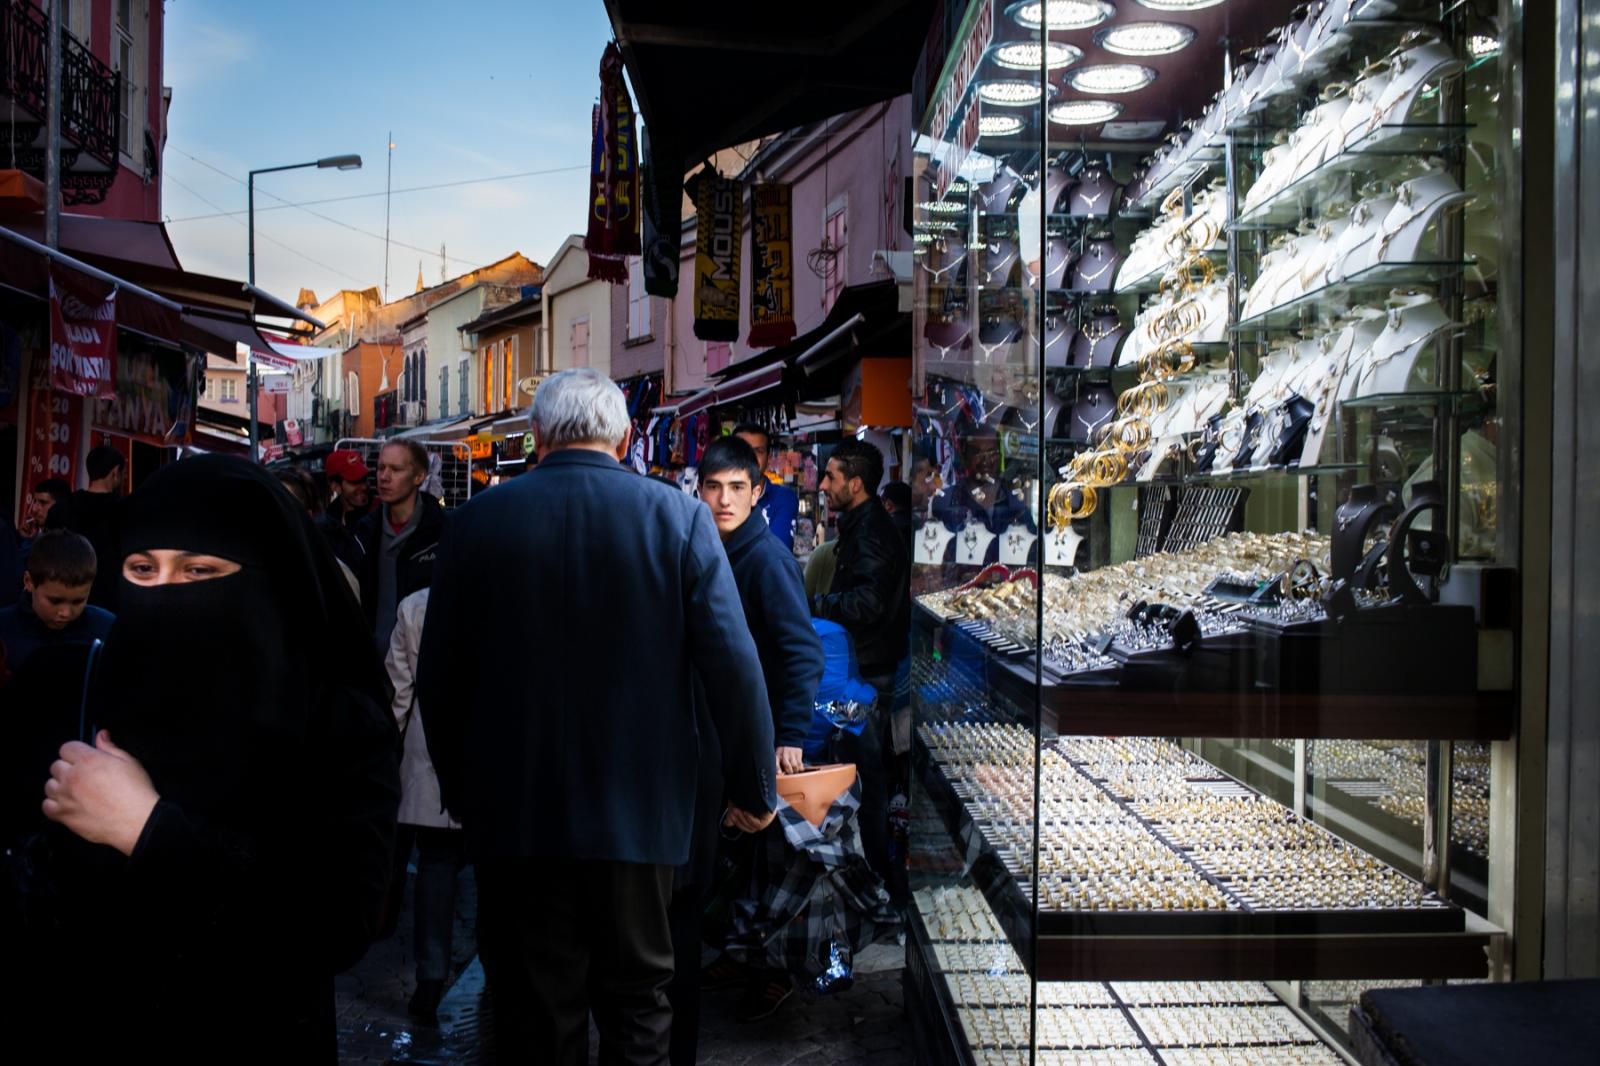 Kemeralti market, Izmir.